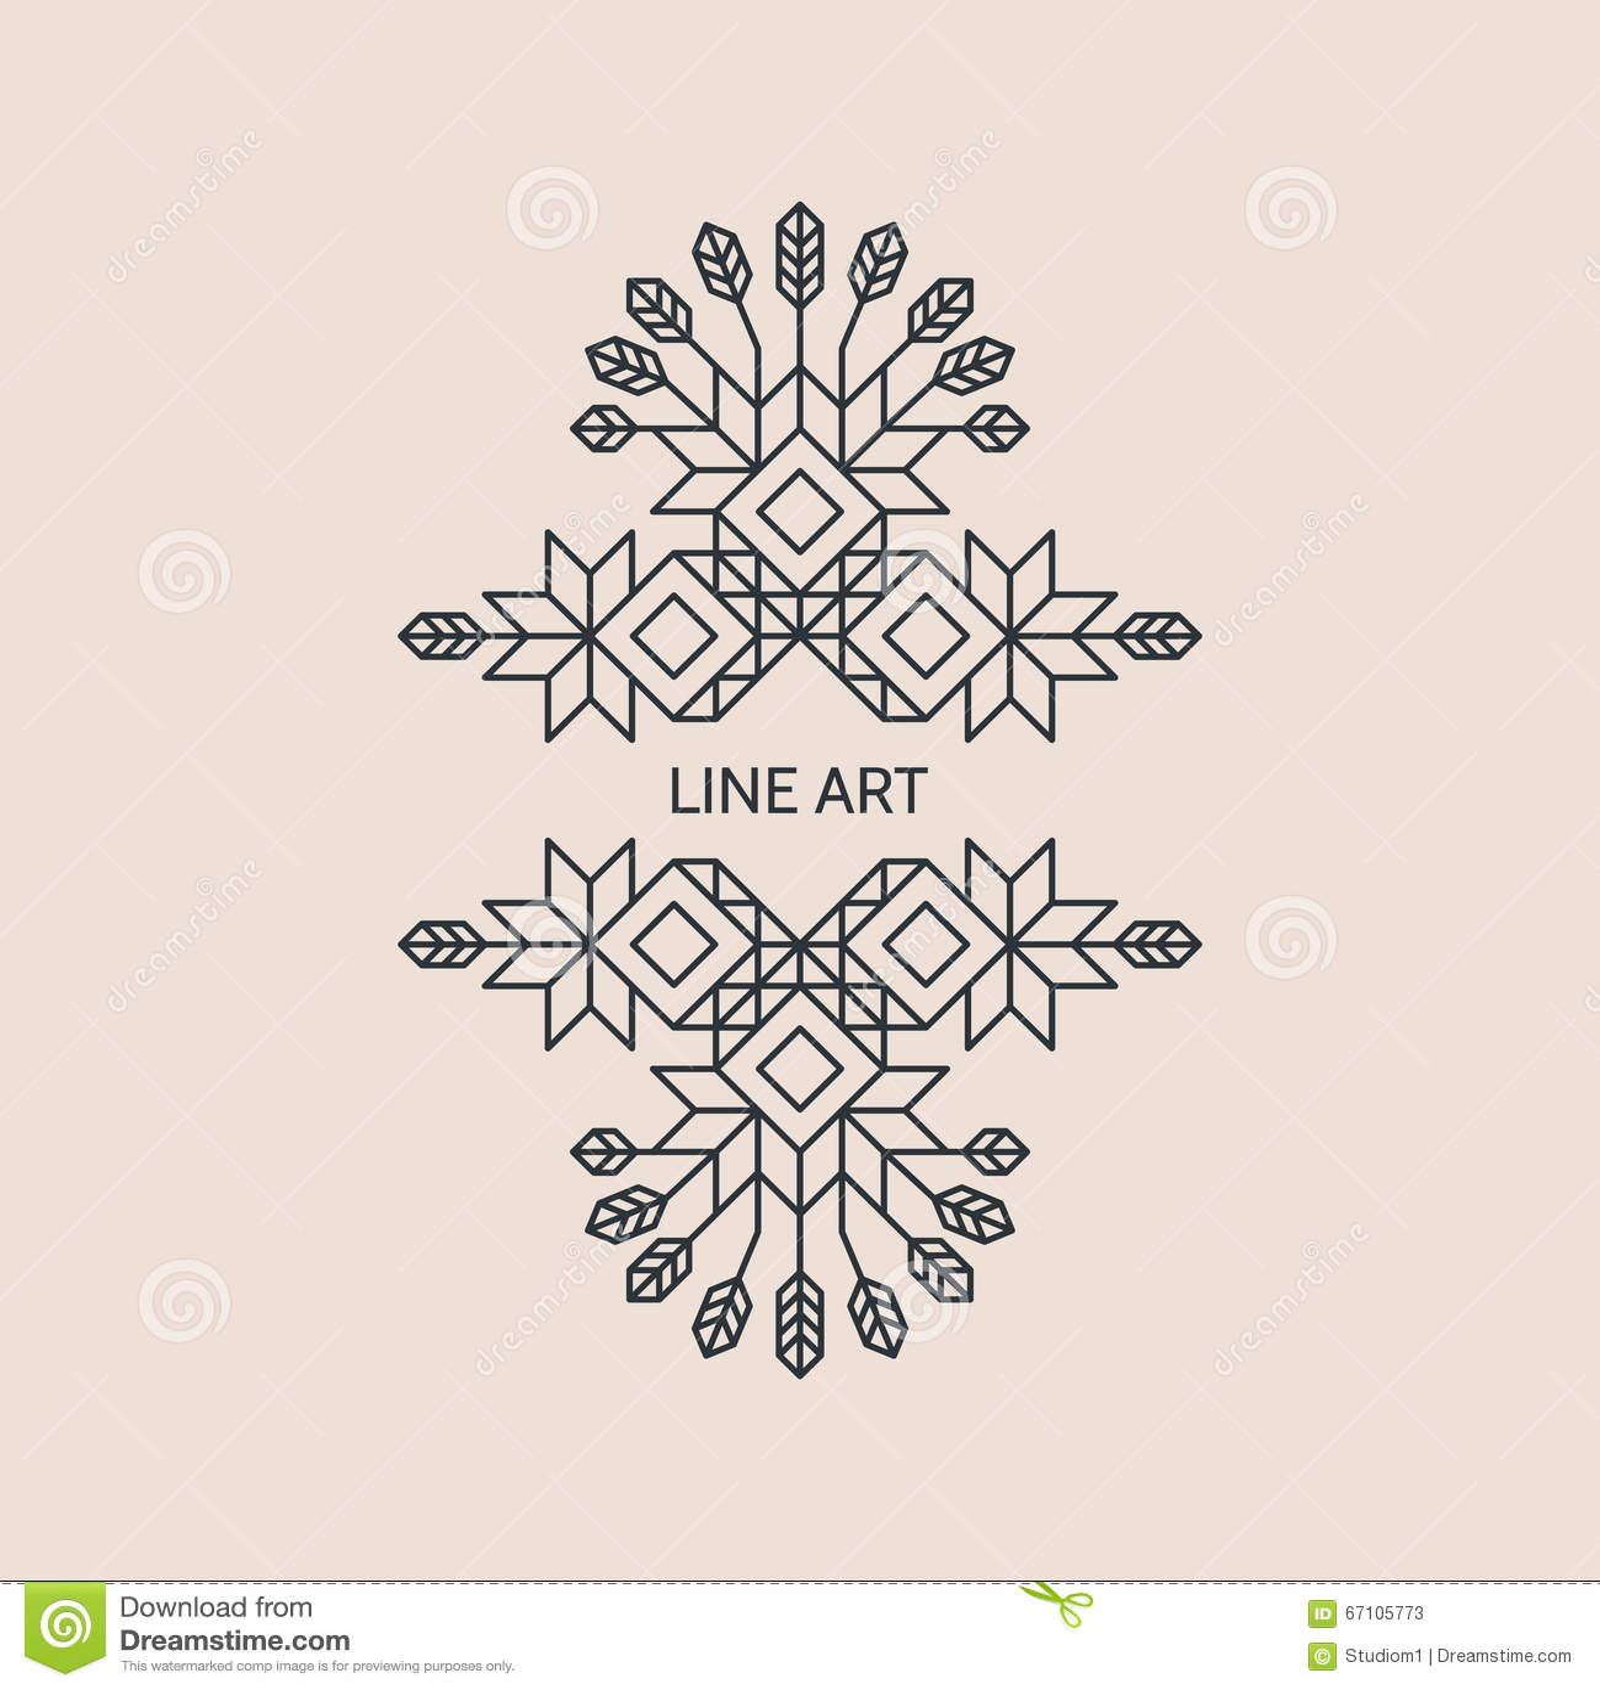 Line Art Text : Vector decorative line art frame geometric vintage style